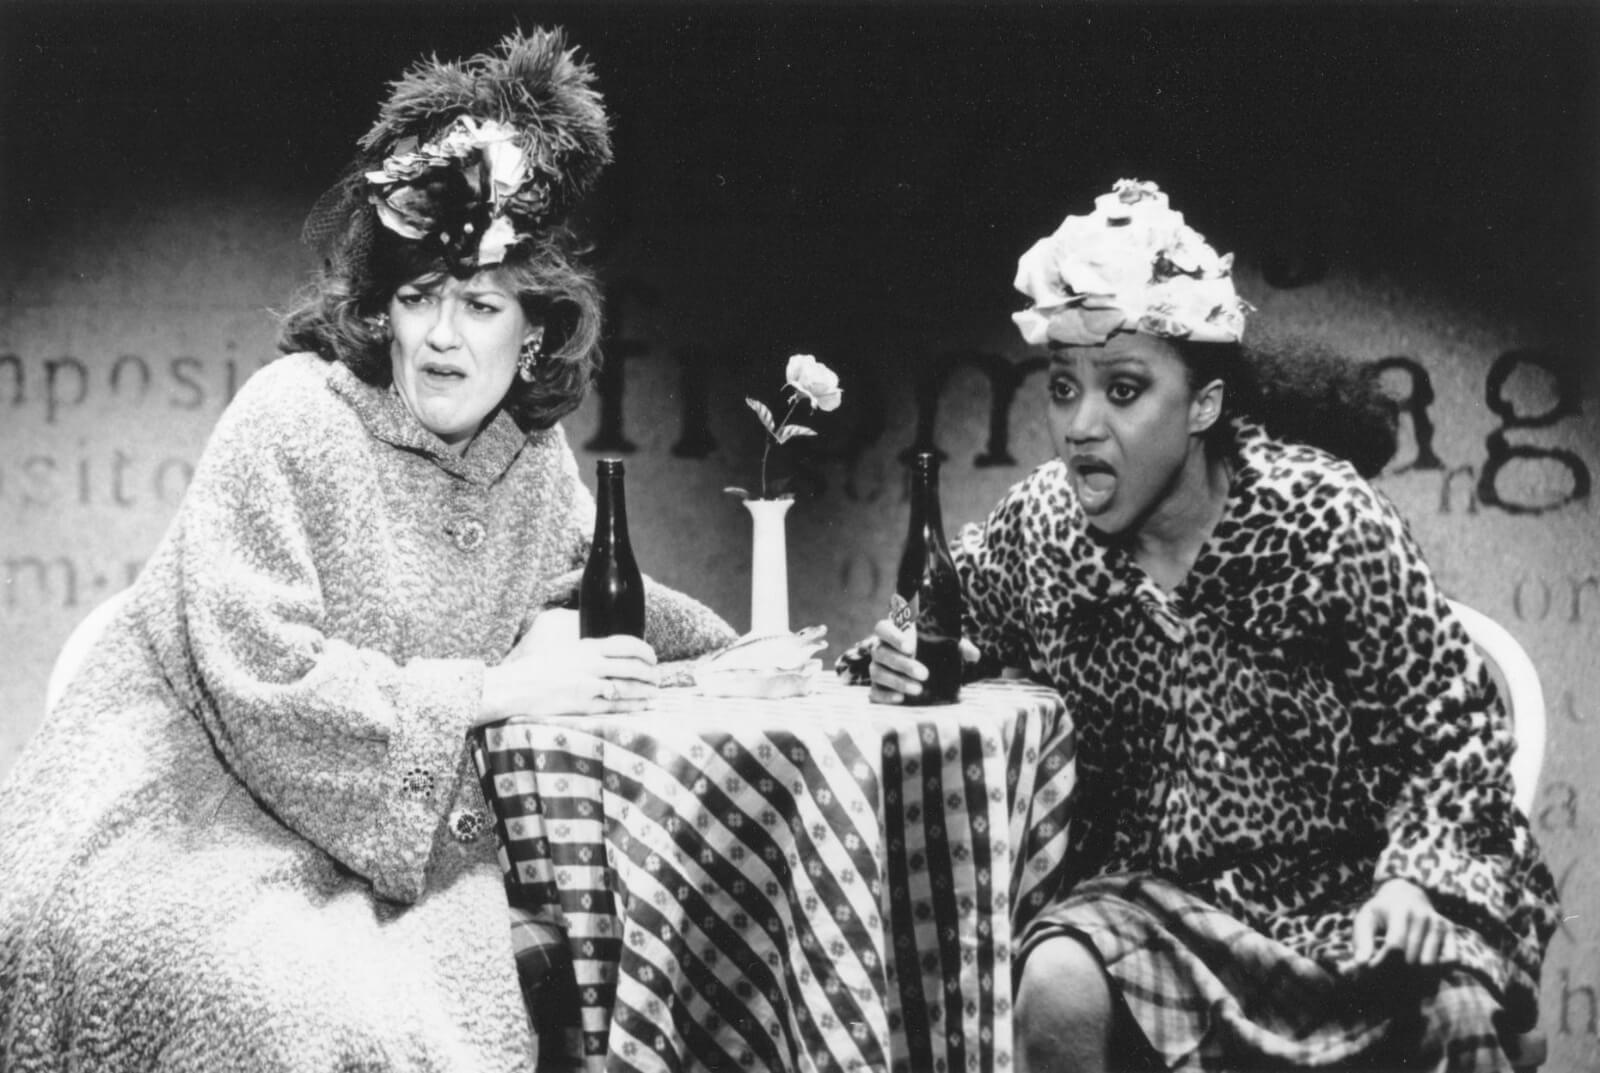 Karen Mason and Brenda Pressley sitting at a table in large hats and fur coats